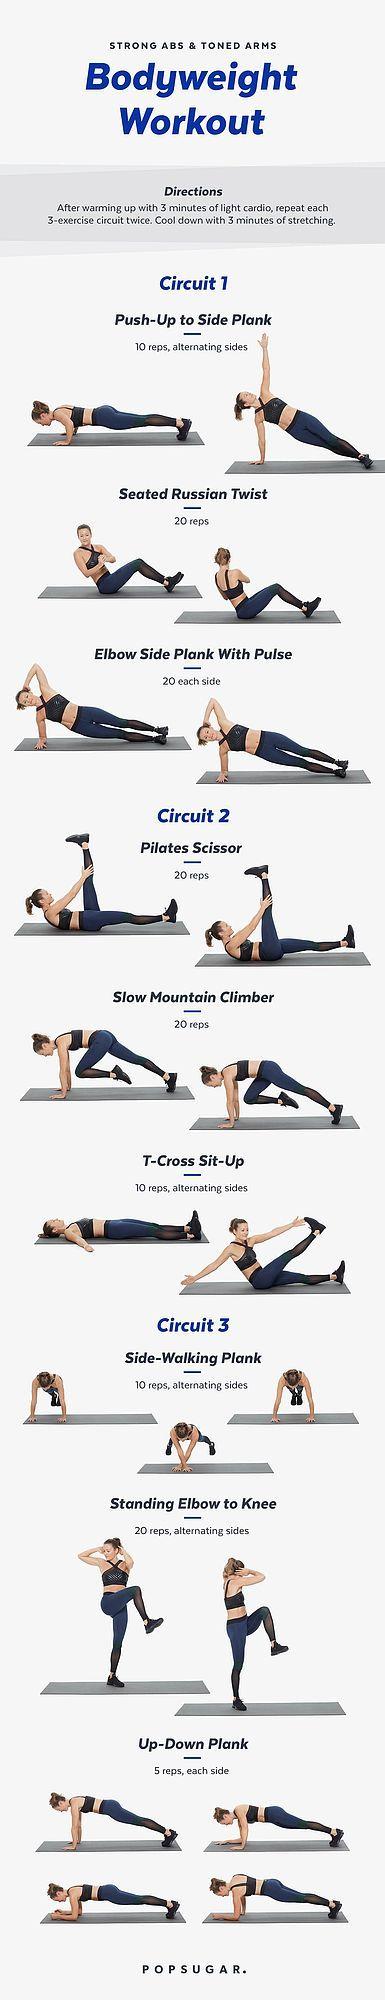 Strong Arms, Sleek Abs Printable Workout | FitSugar | Bloglovin'